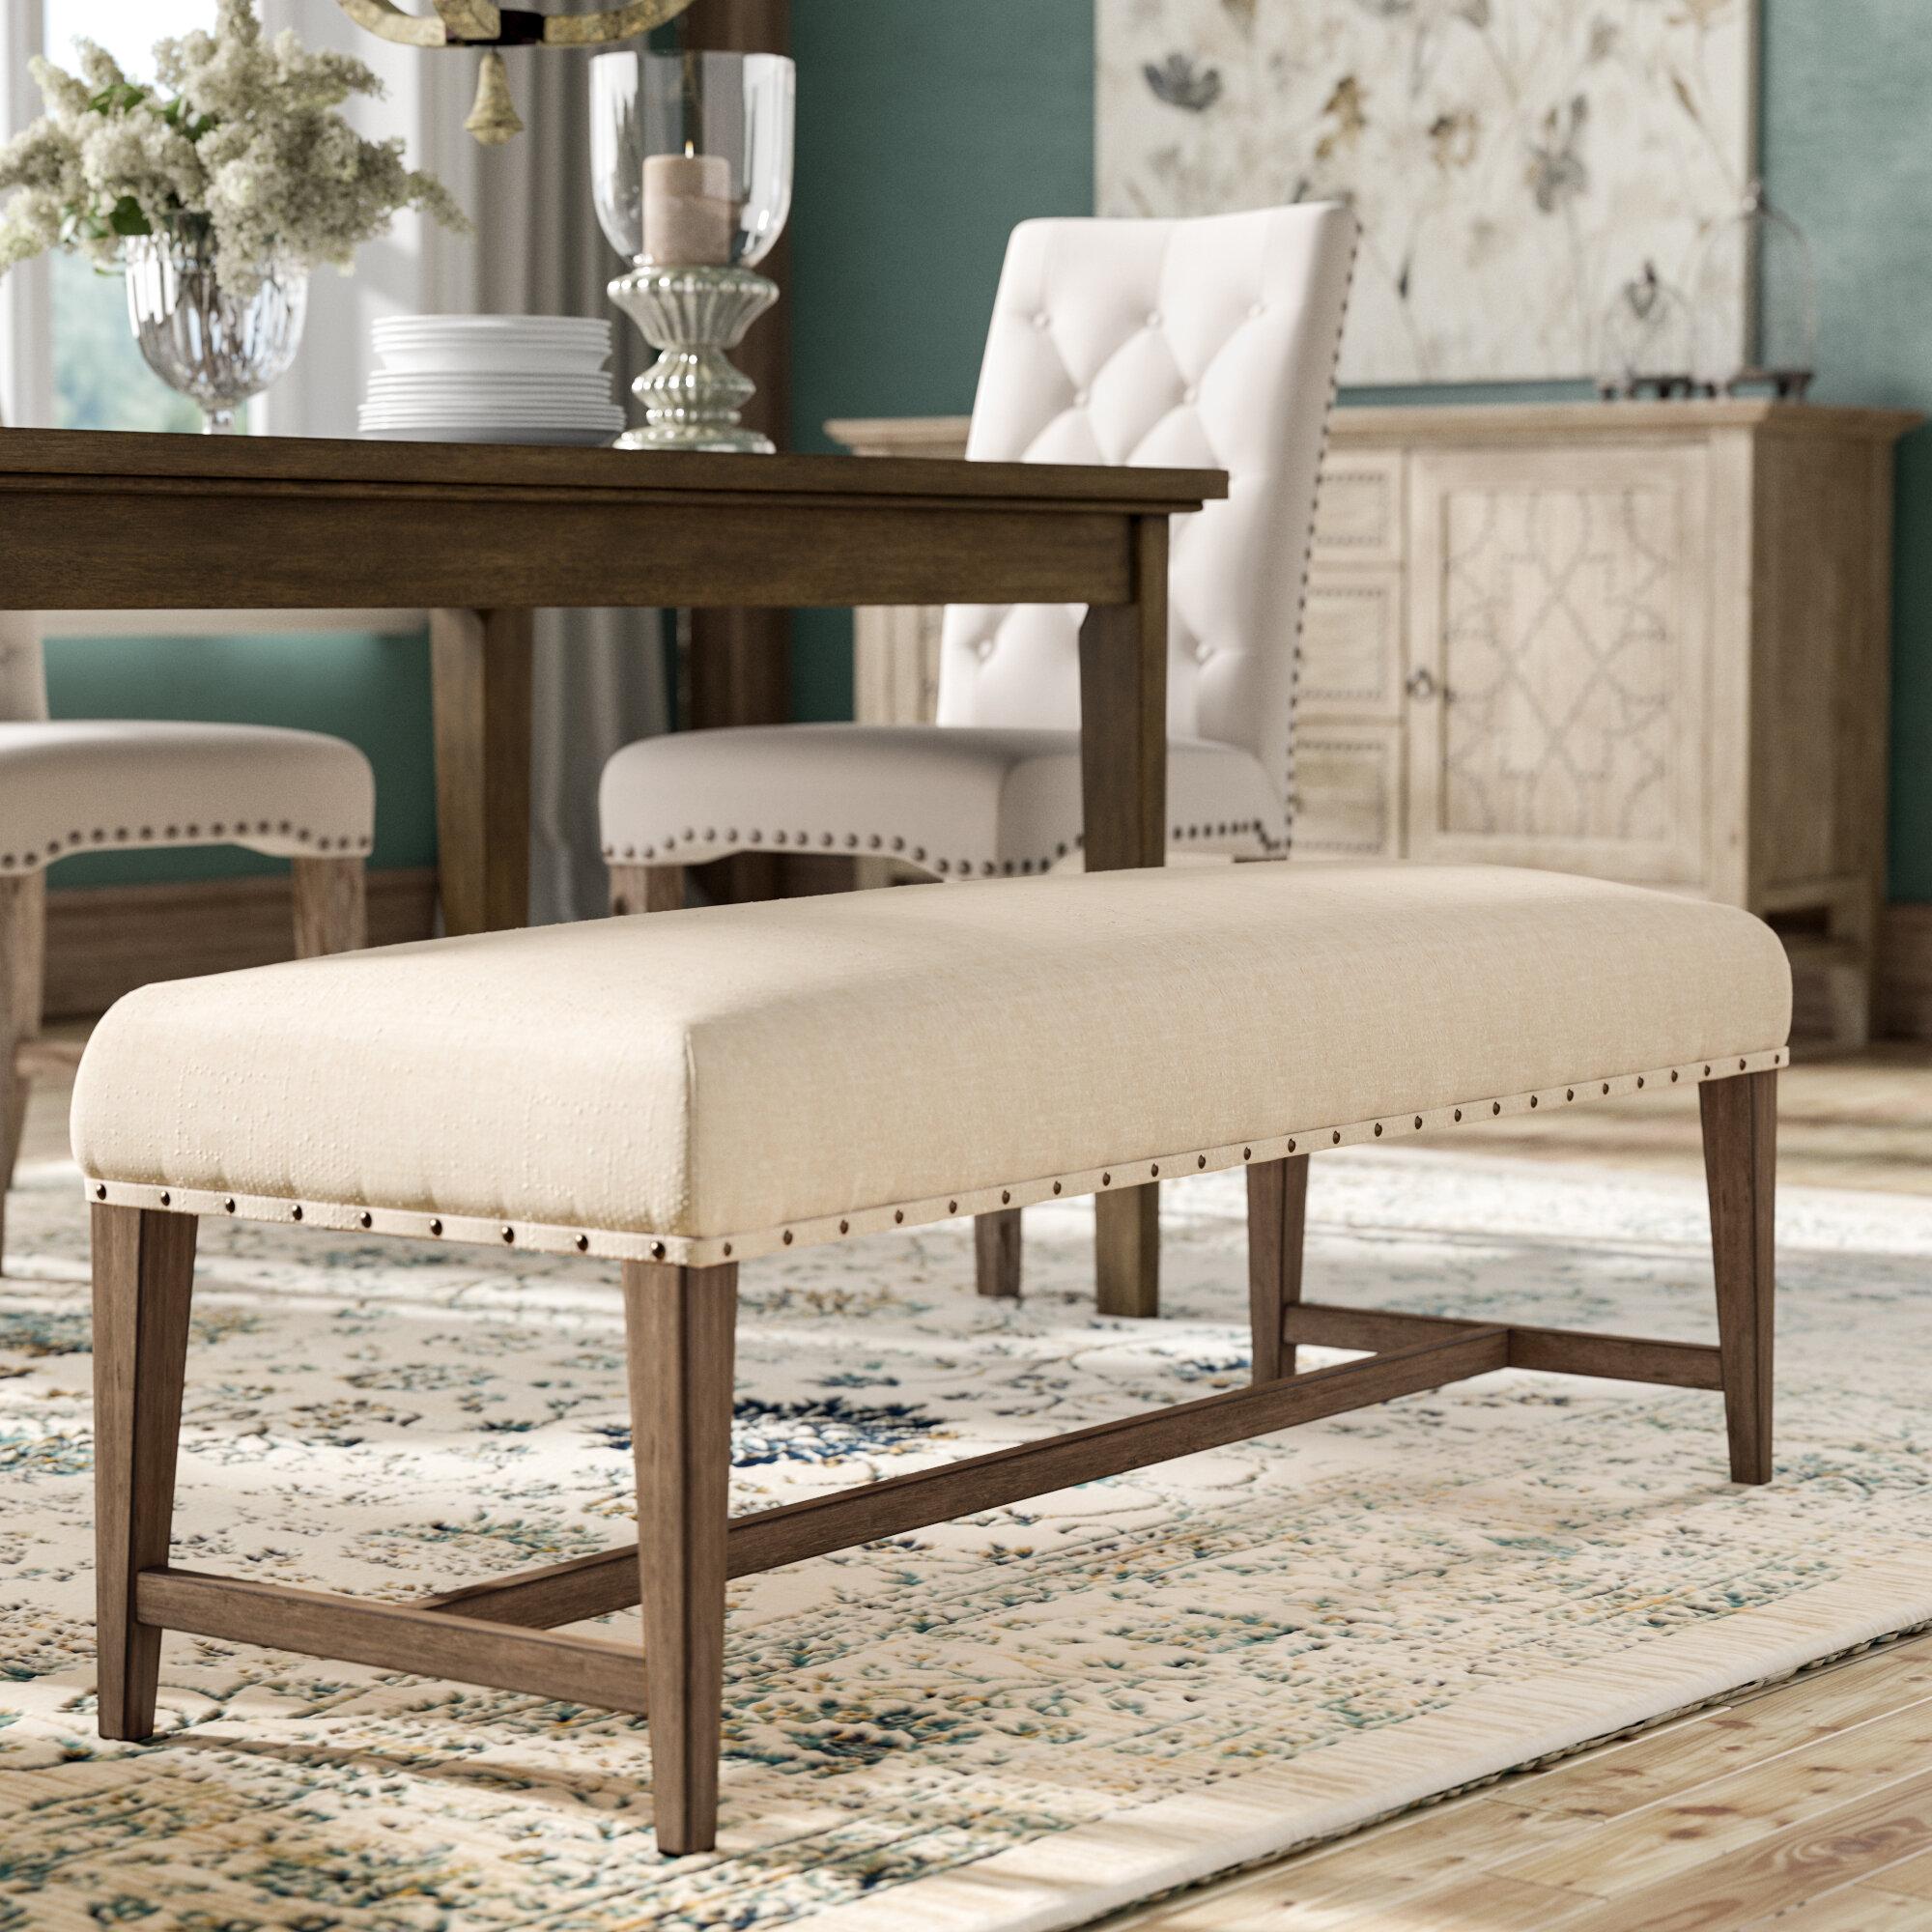 Lark Manor Amity Upholstered Bench Reviews Wayfair